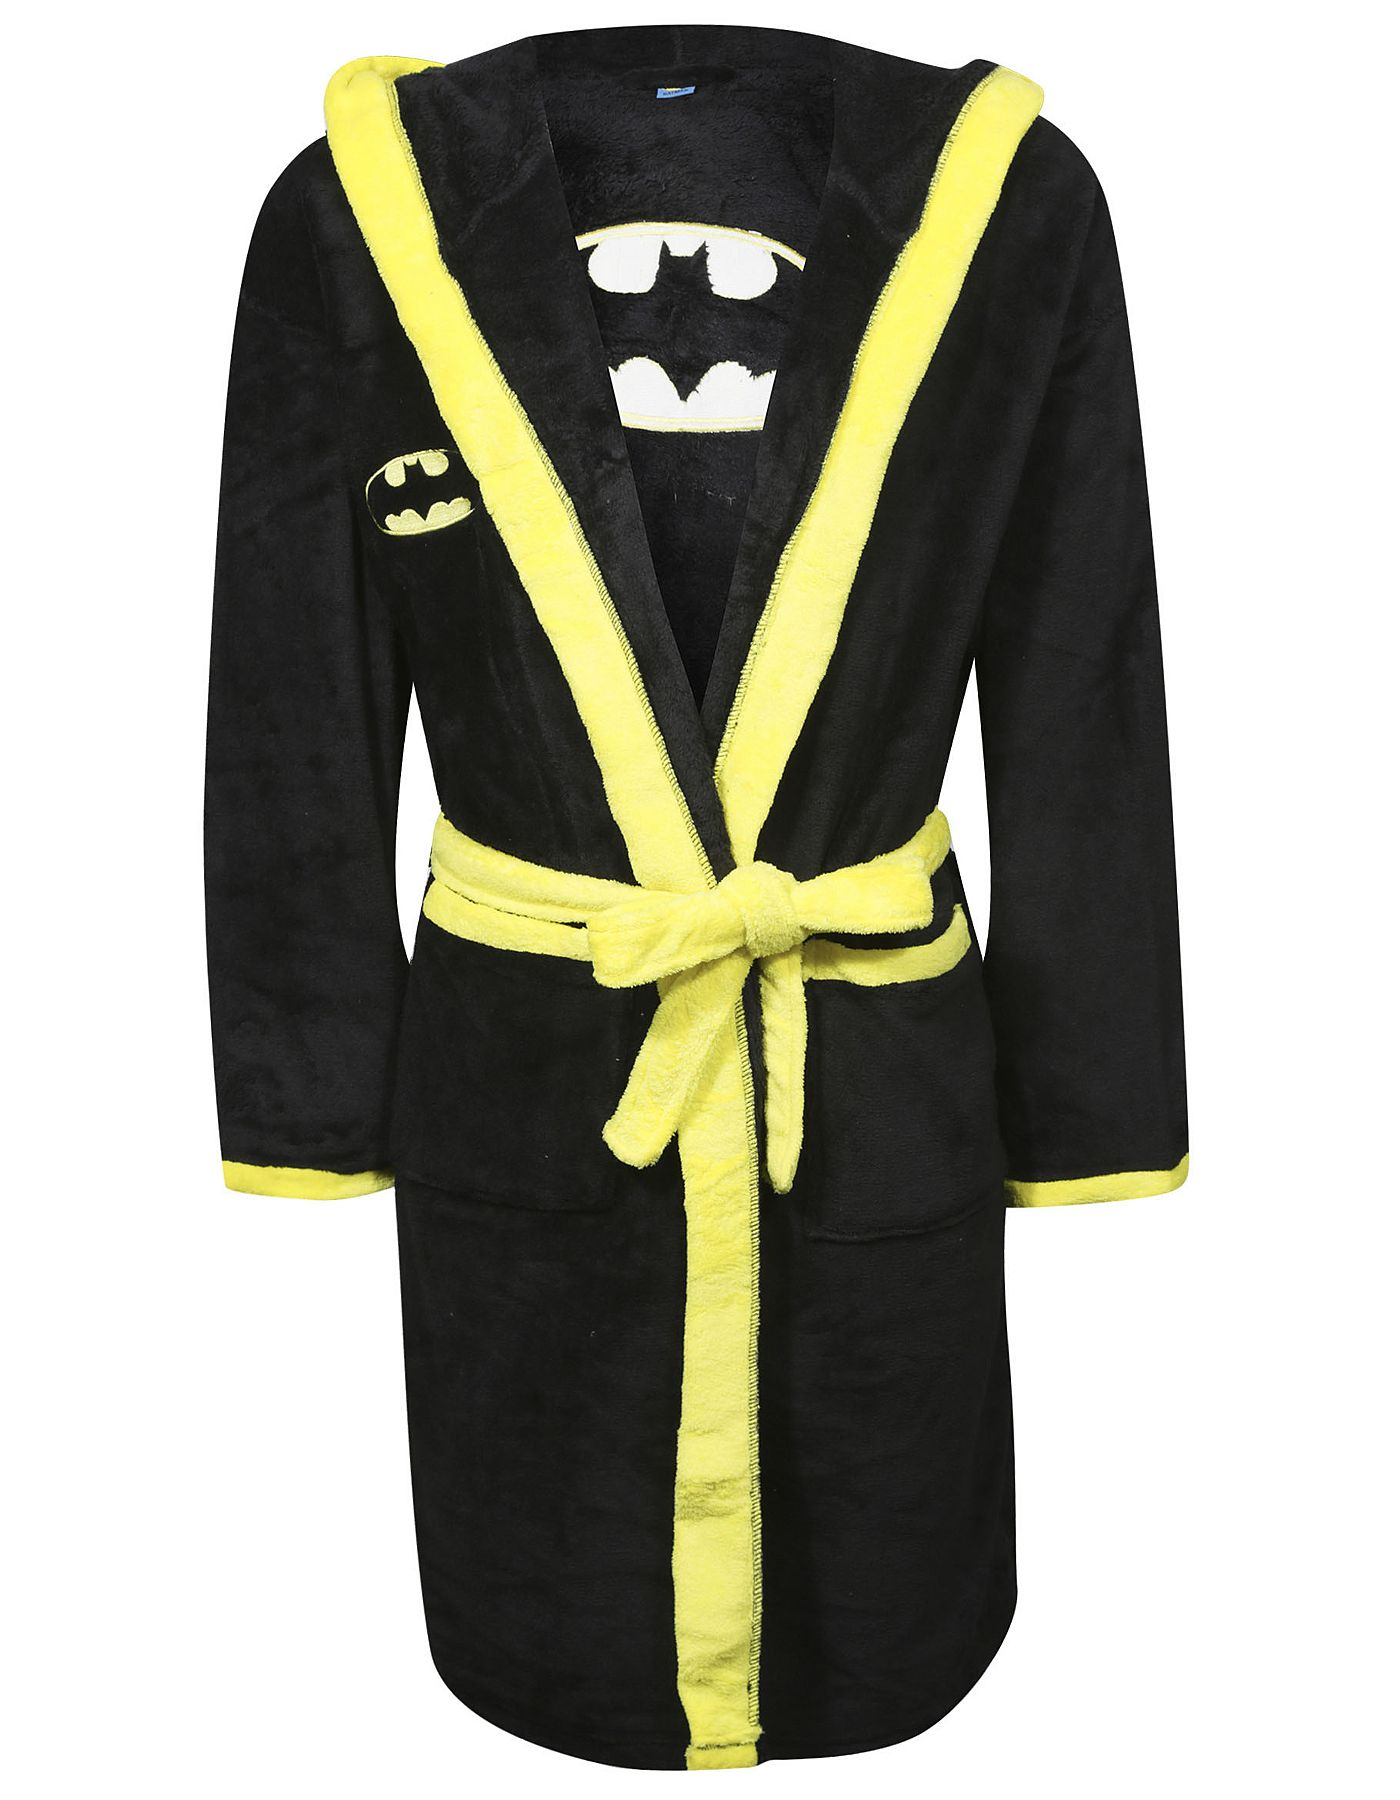 Batman Dressing Gown Men George At Asda Shit I Want